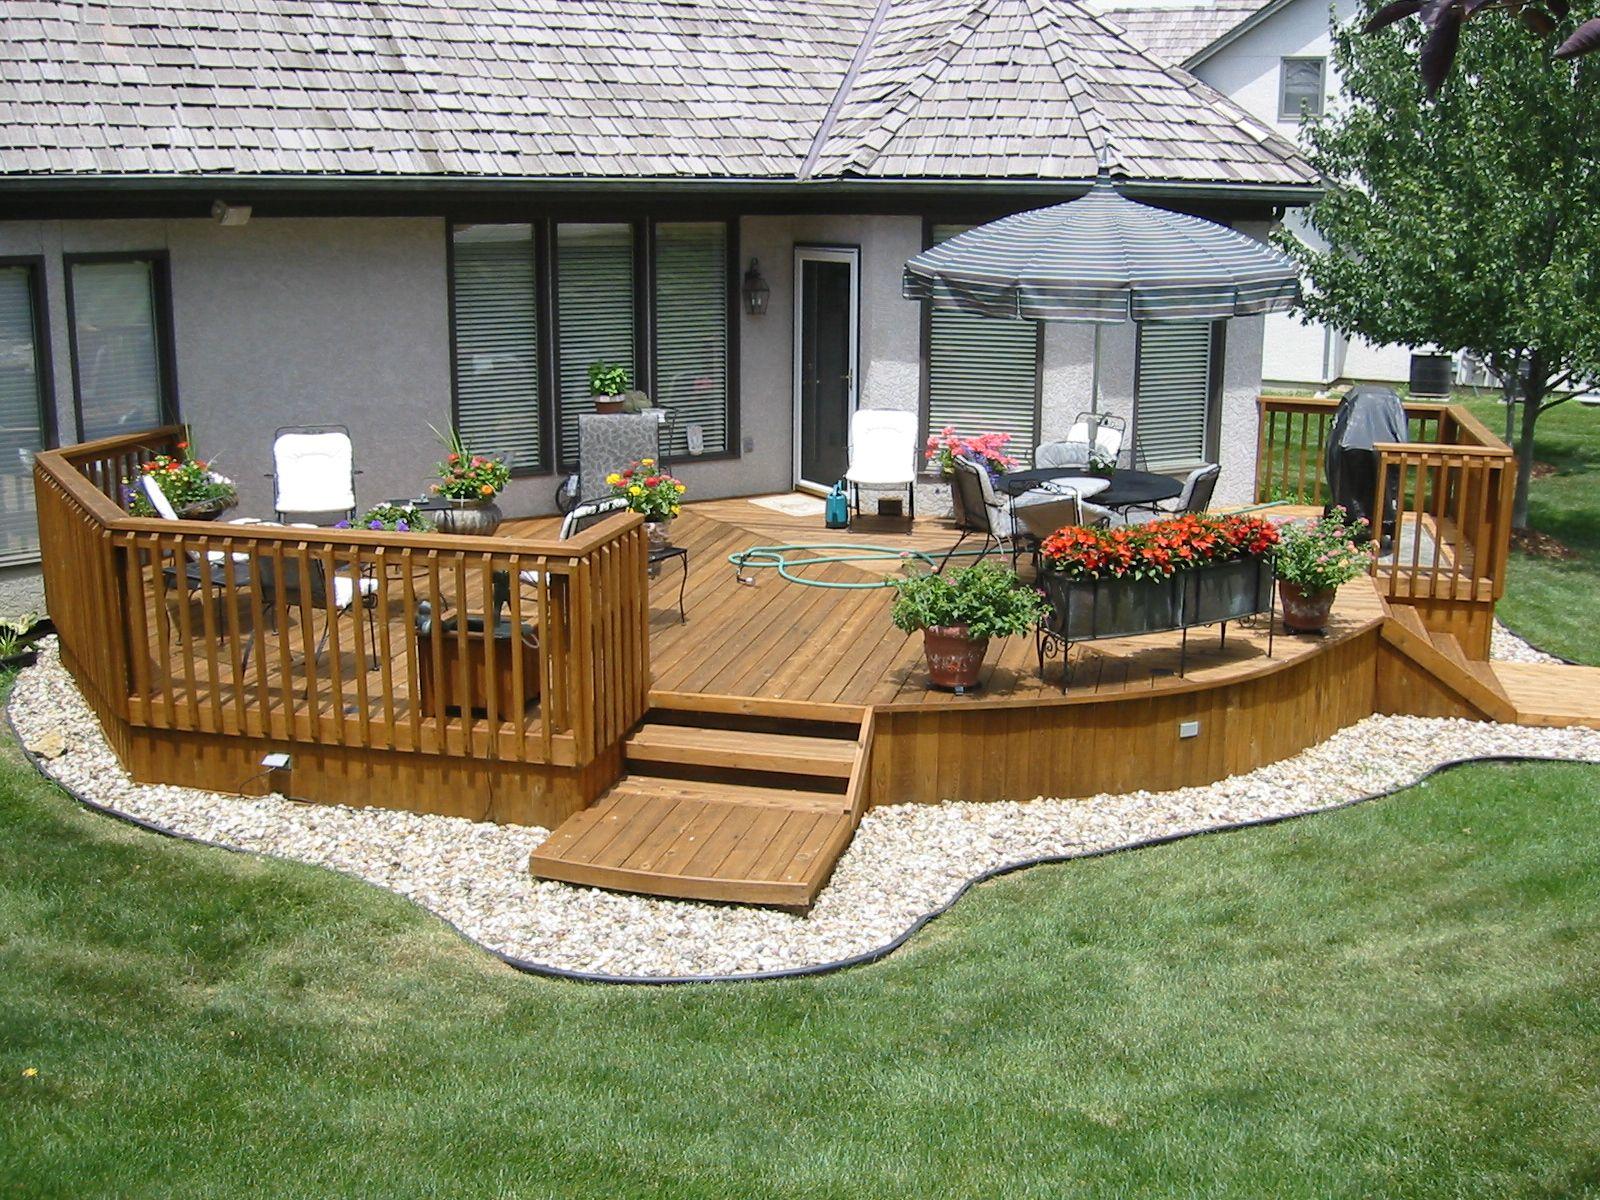 ground level deck - Google Search   Deck designs backyard ... on Ground Level Patio Ideas id=24359